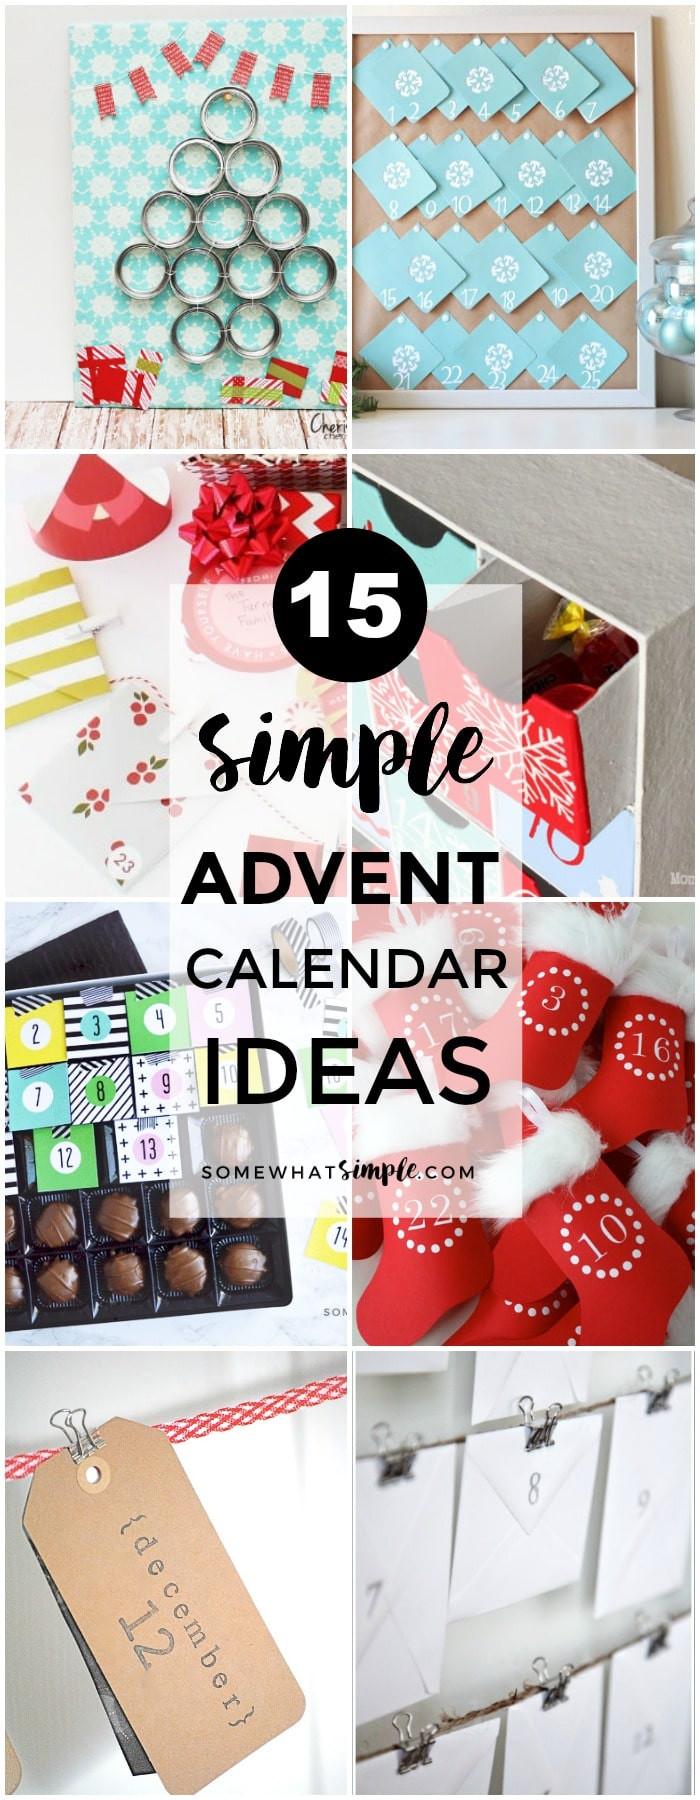 Best ideas about Advent Calendar DIY . Save or Pin 12 DIY Advent Calendar Ideas Now.